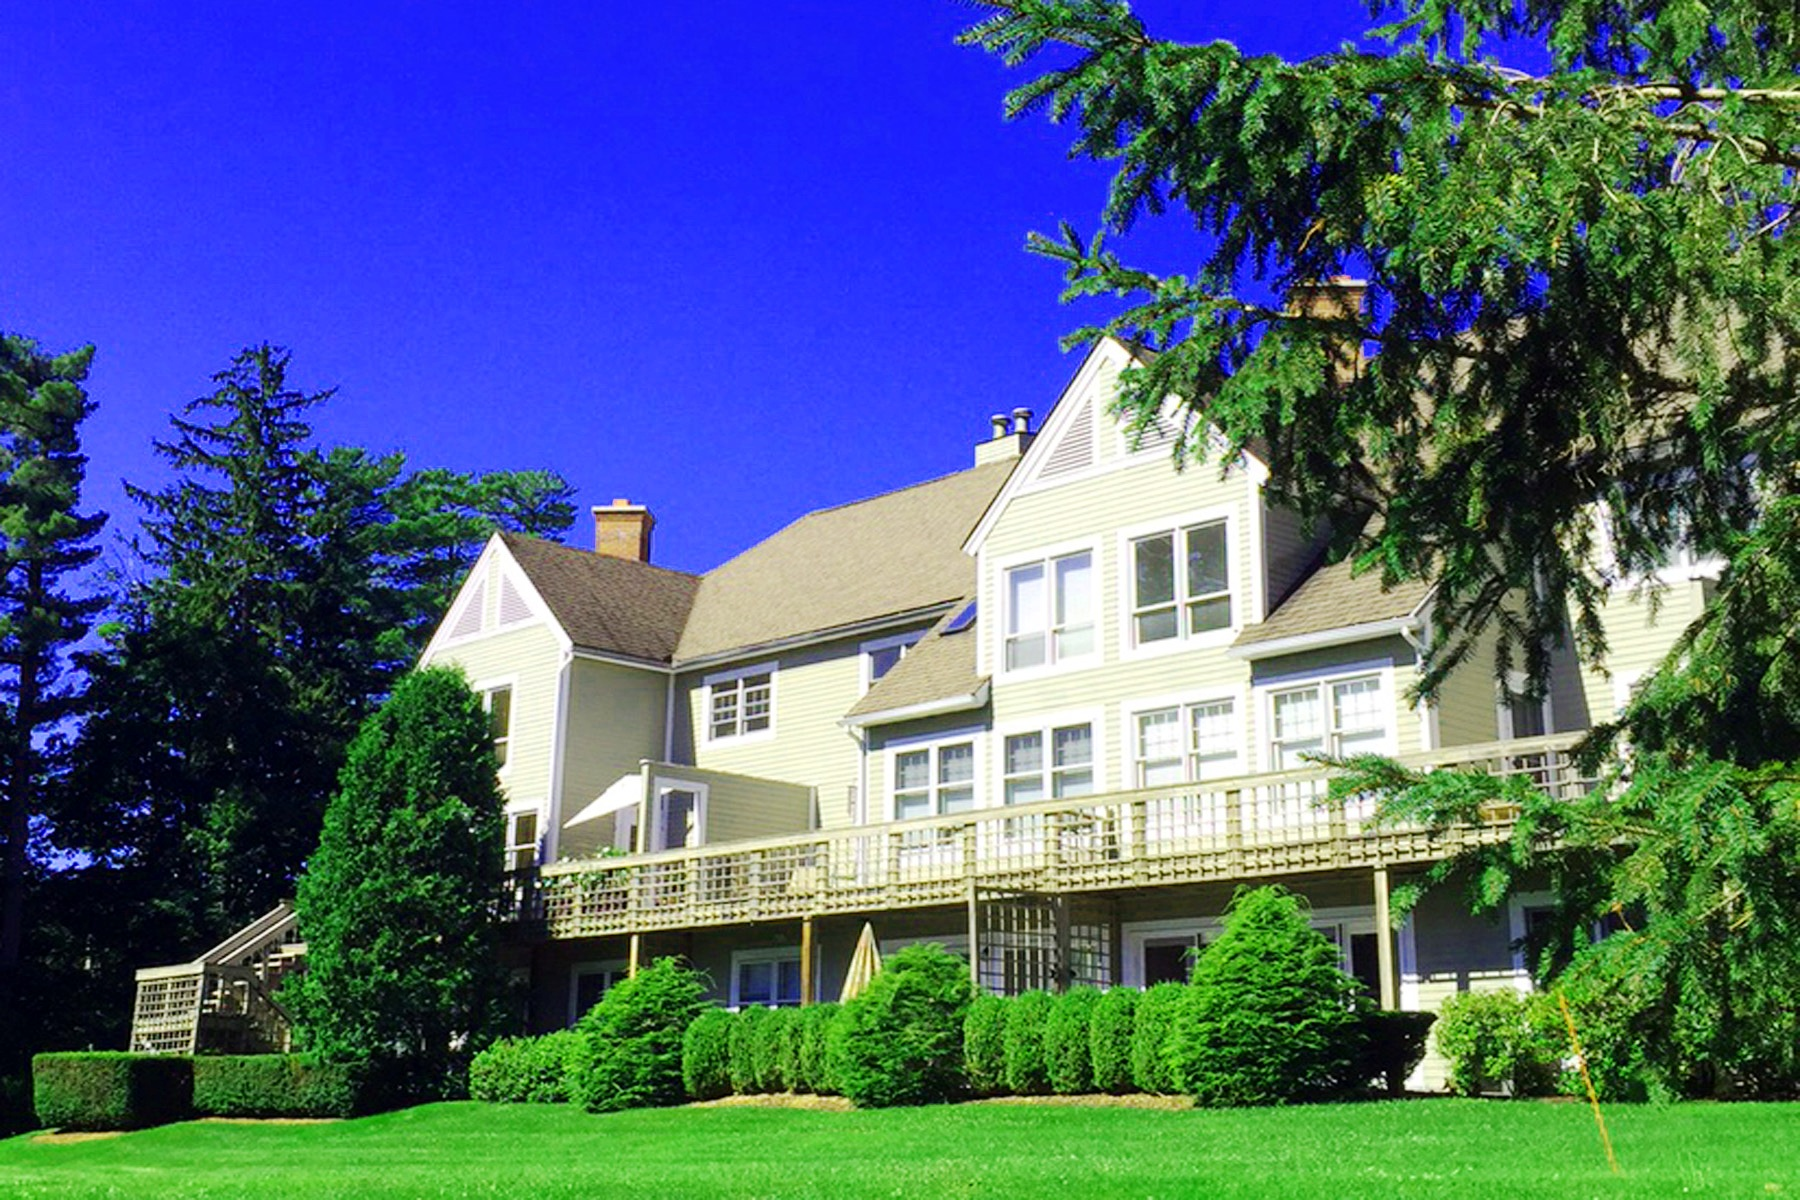 Casa Unifamiliar por un Venta en Condominium Close To Main Street 80 Taconic Ave Great Barrington, Massachusetts 01230 Estados Unidos